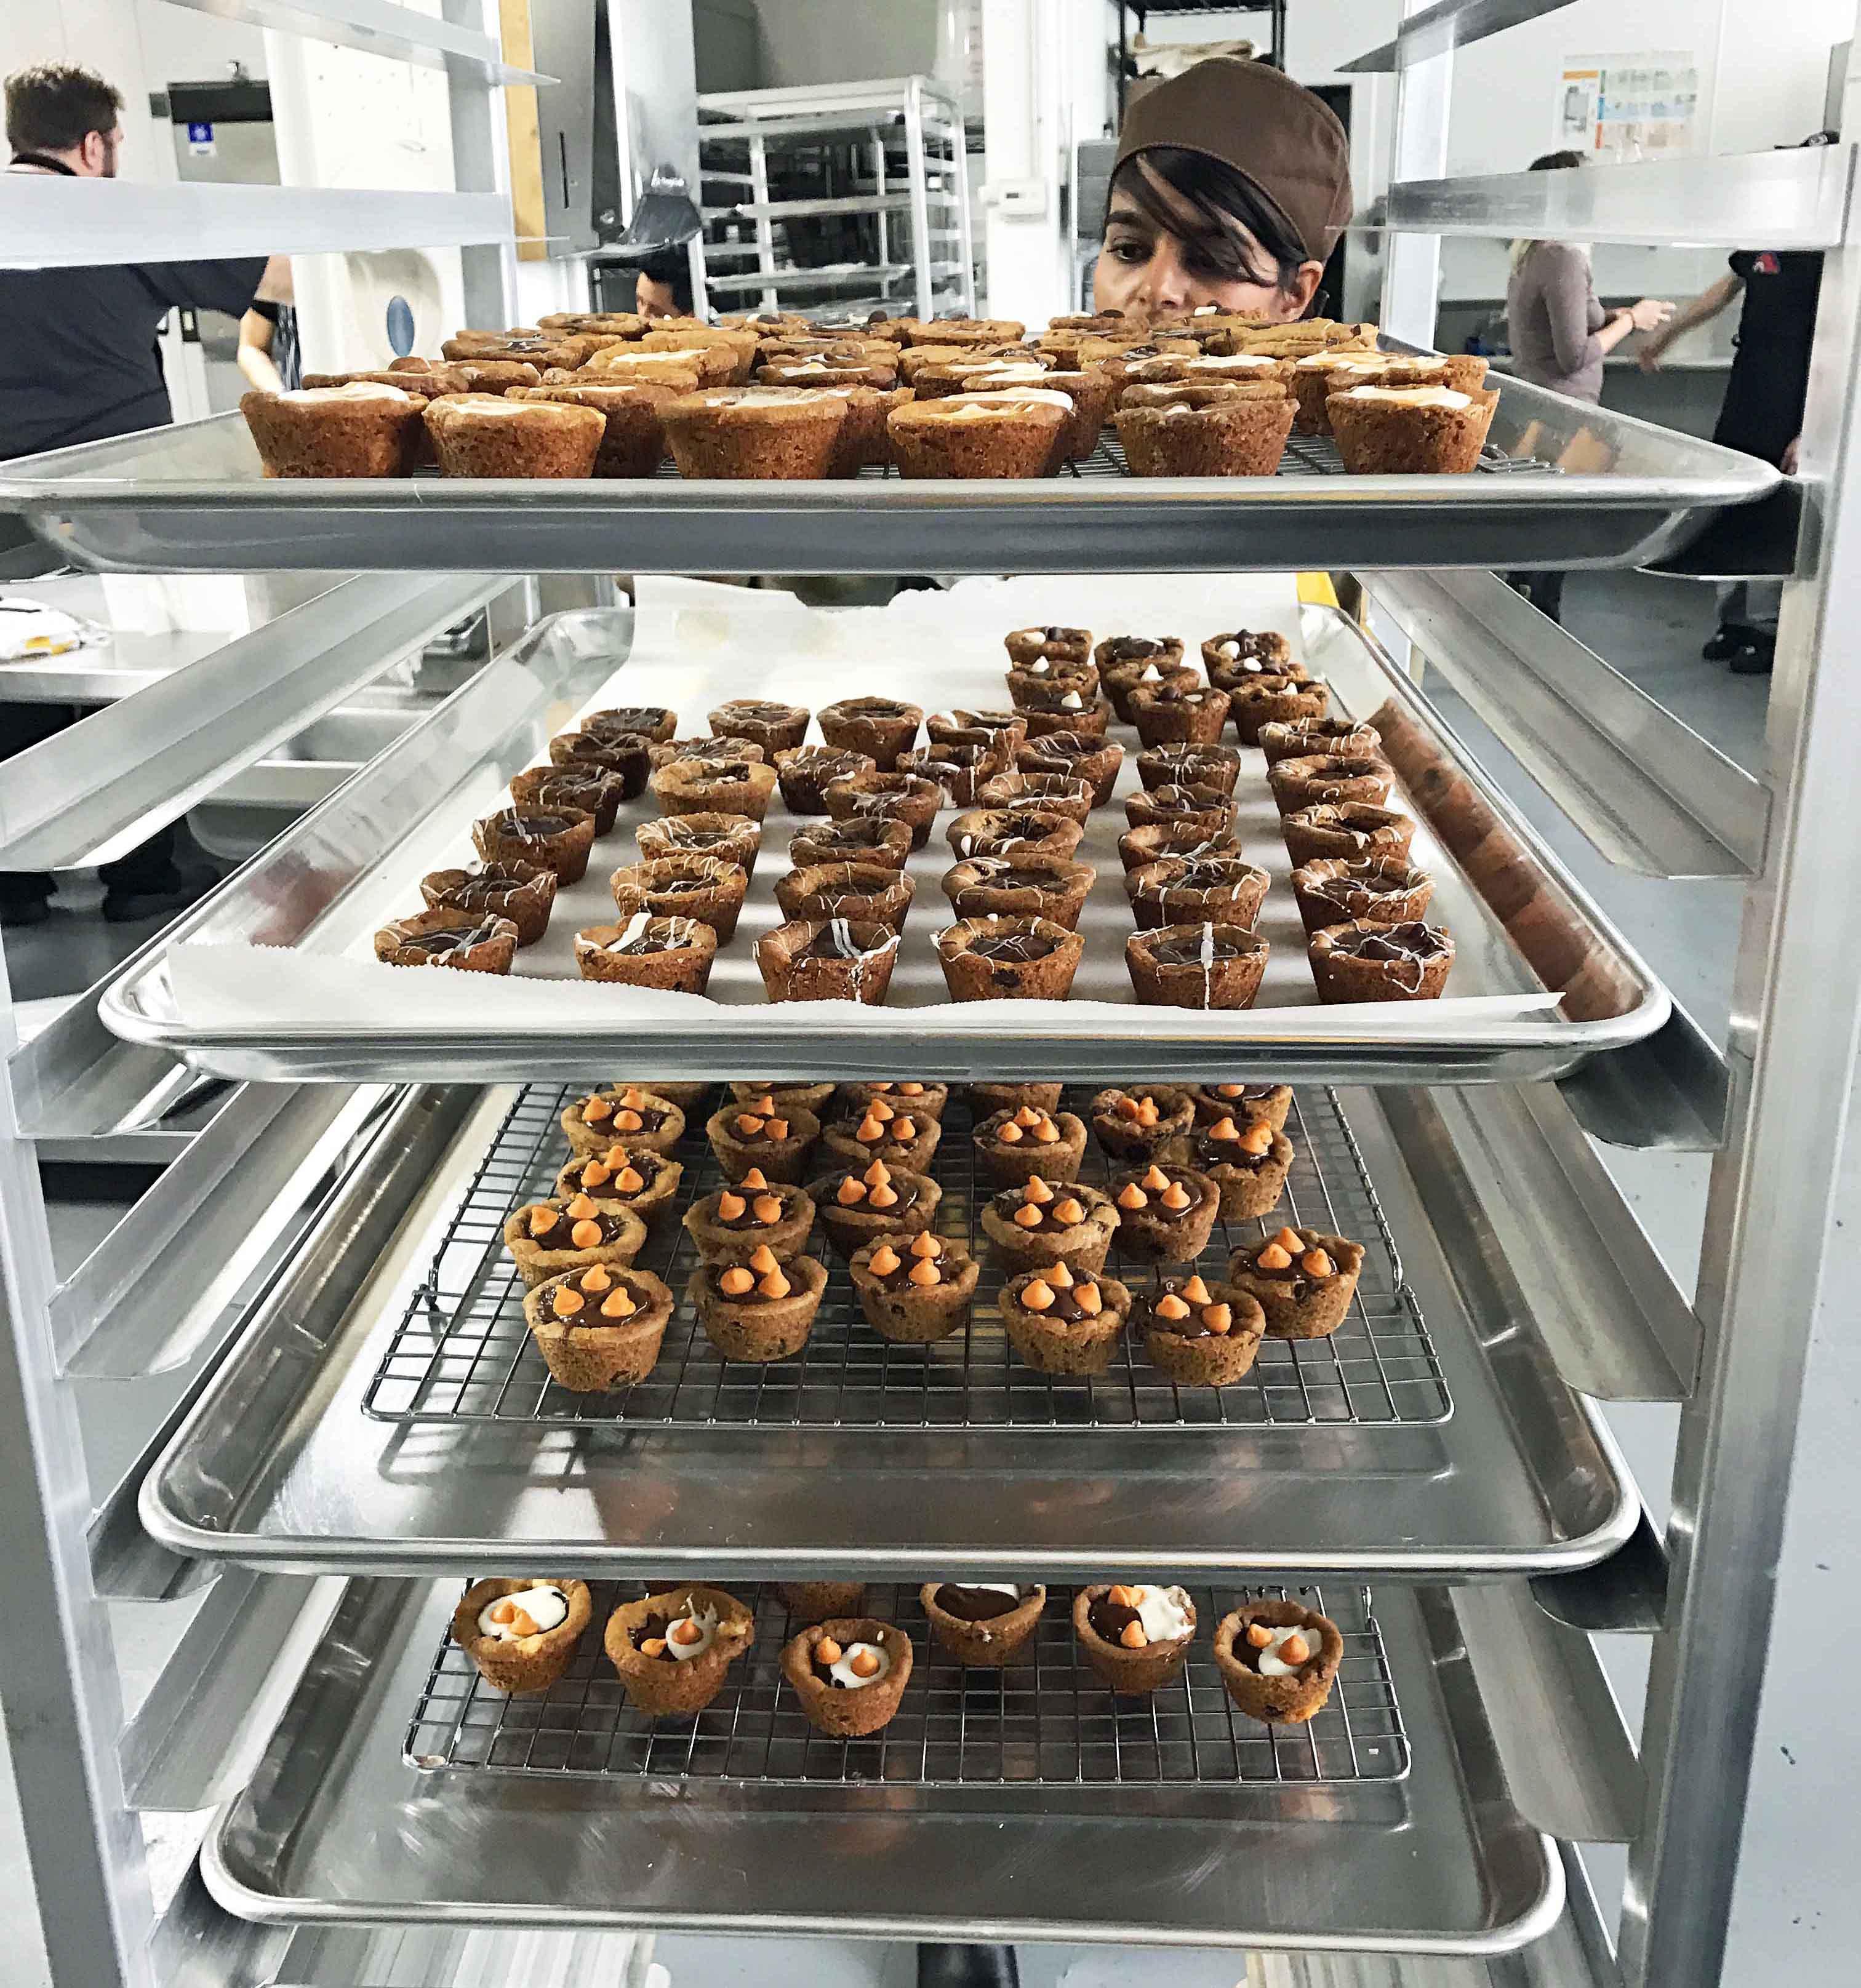 Bake Some Good by Nestle. #BakeSomeGood